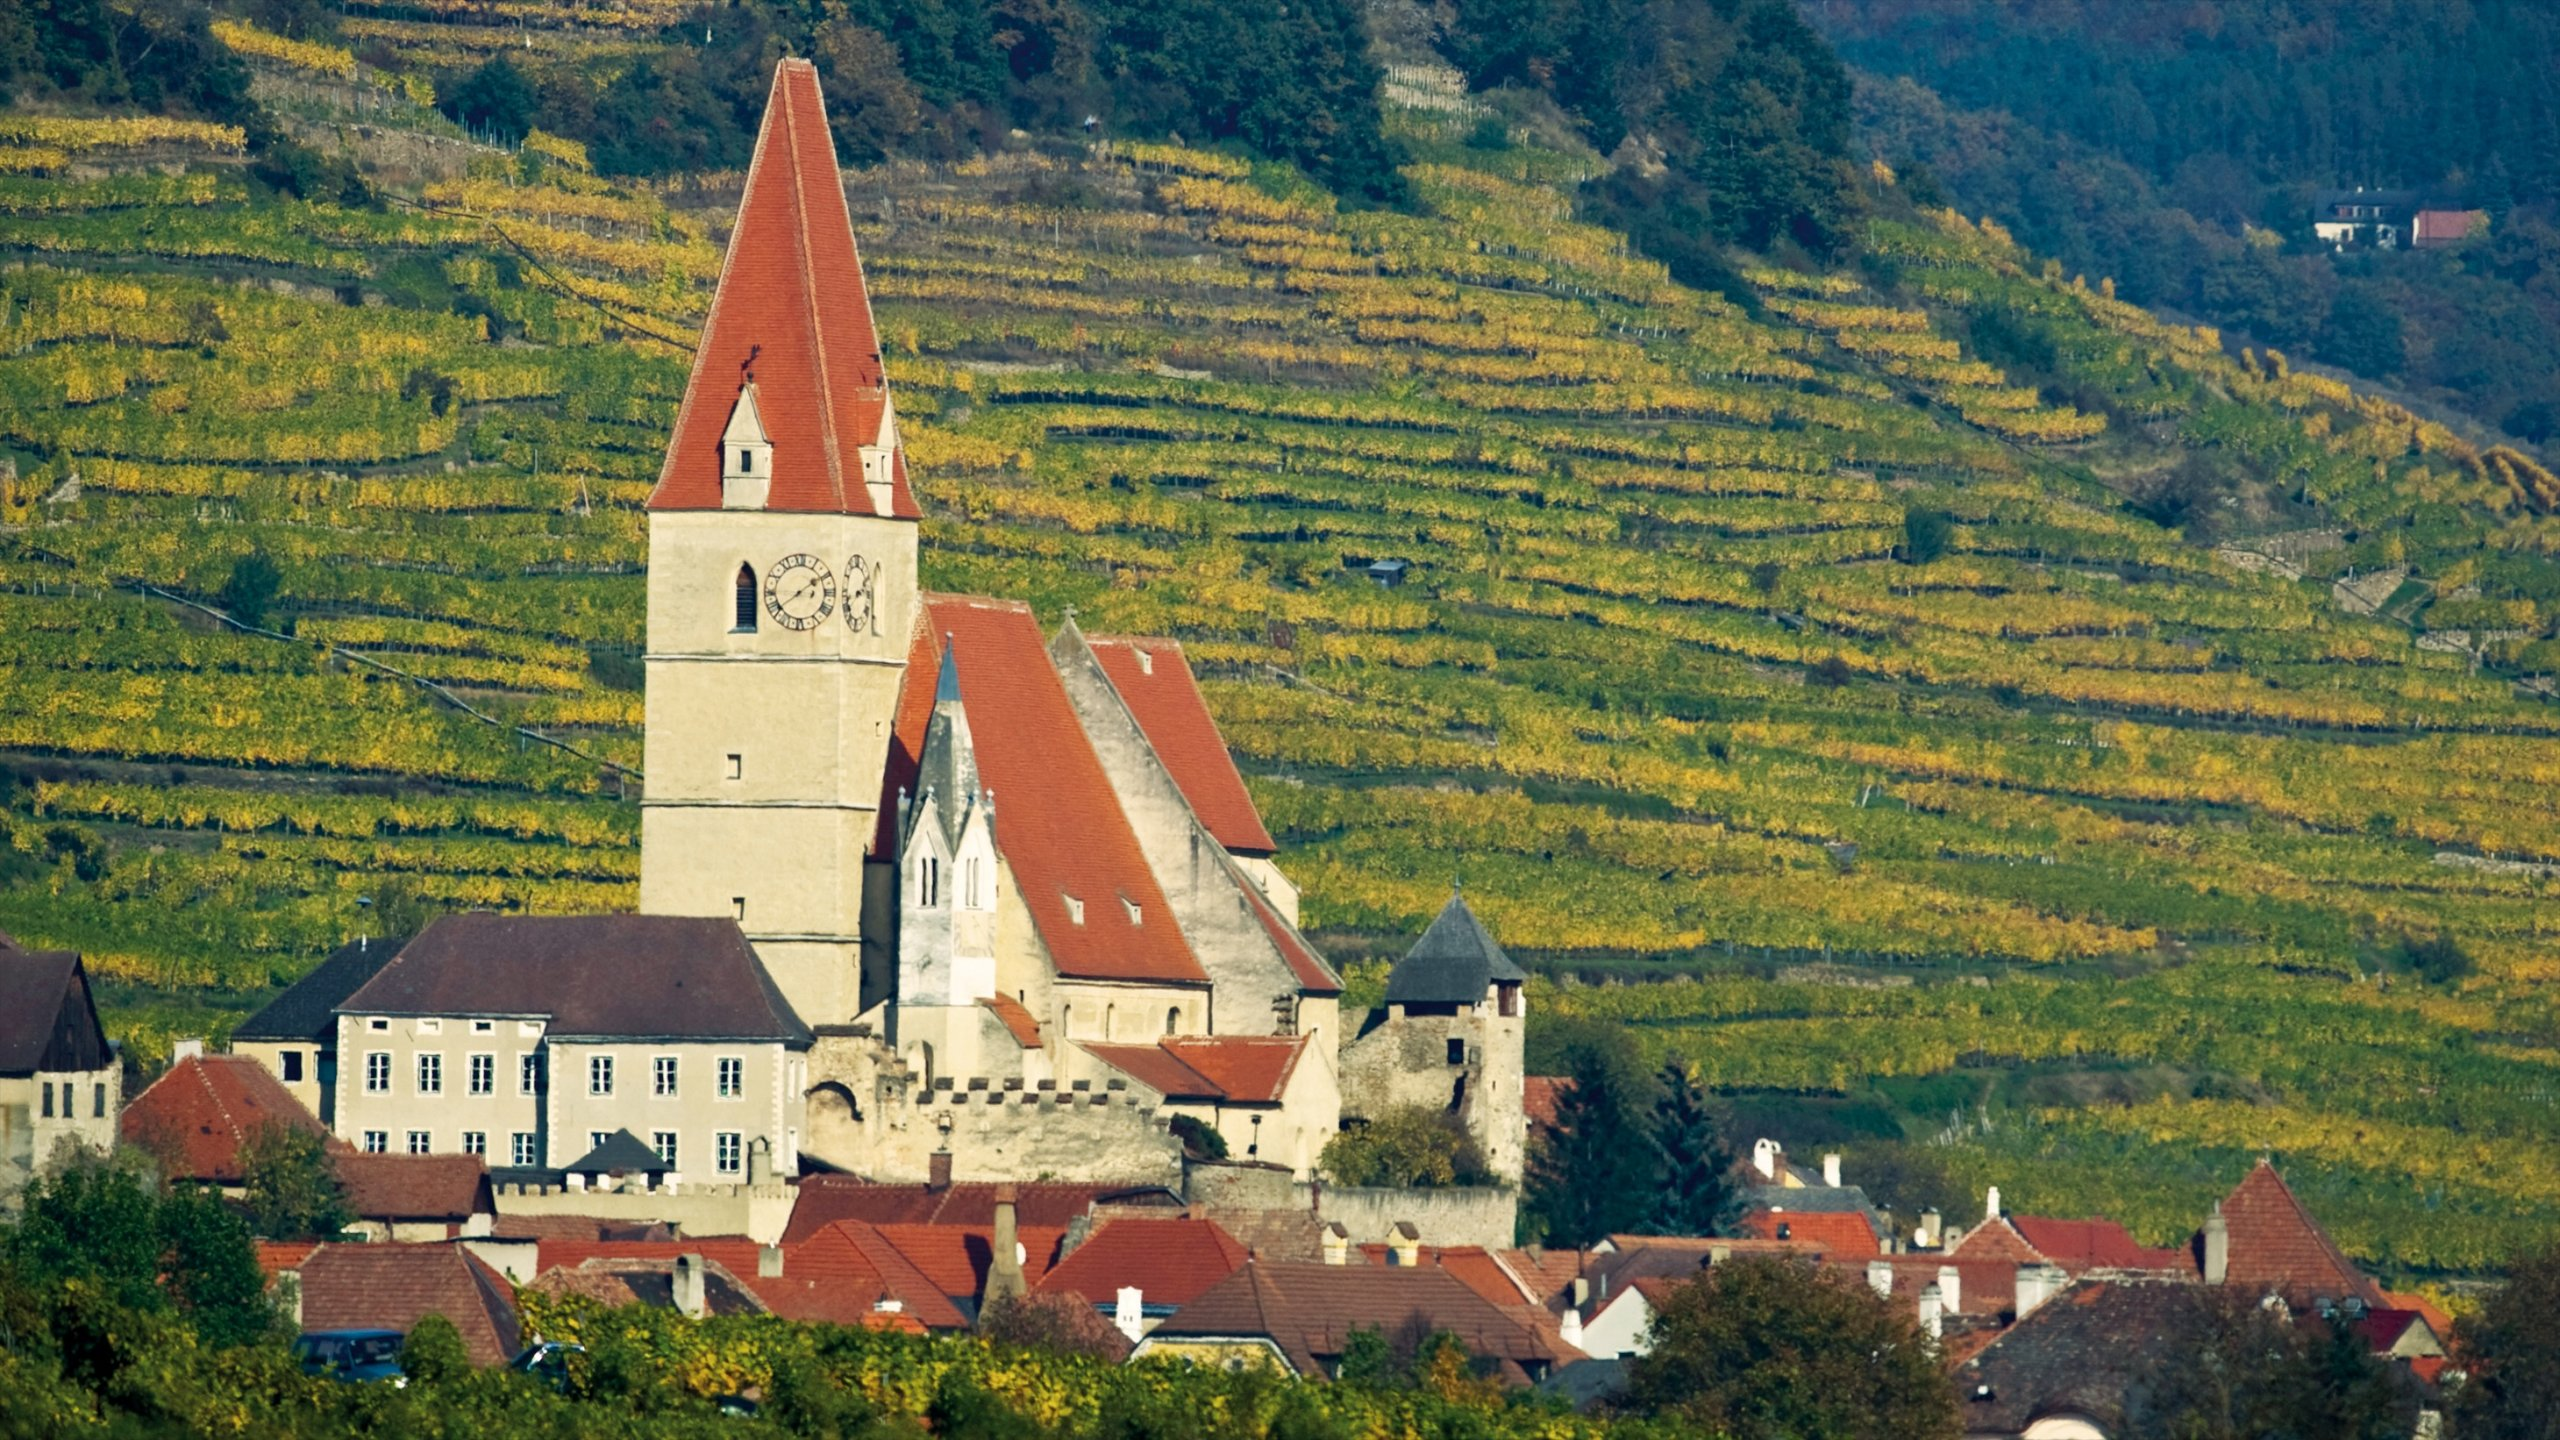 Krems-Land District, Lower Austria, Austria